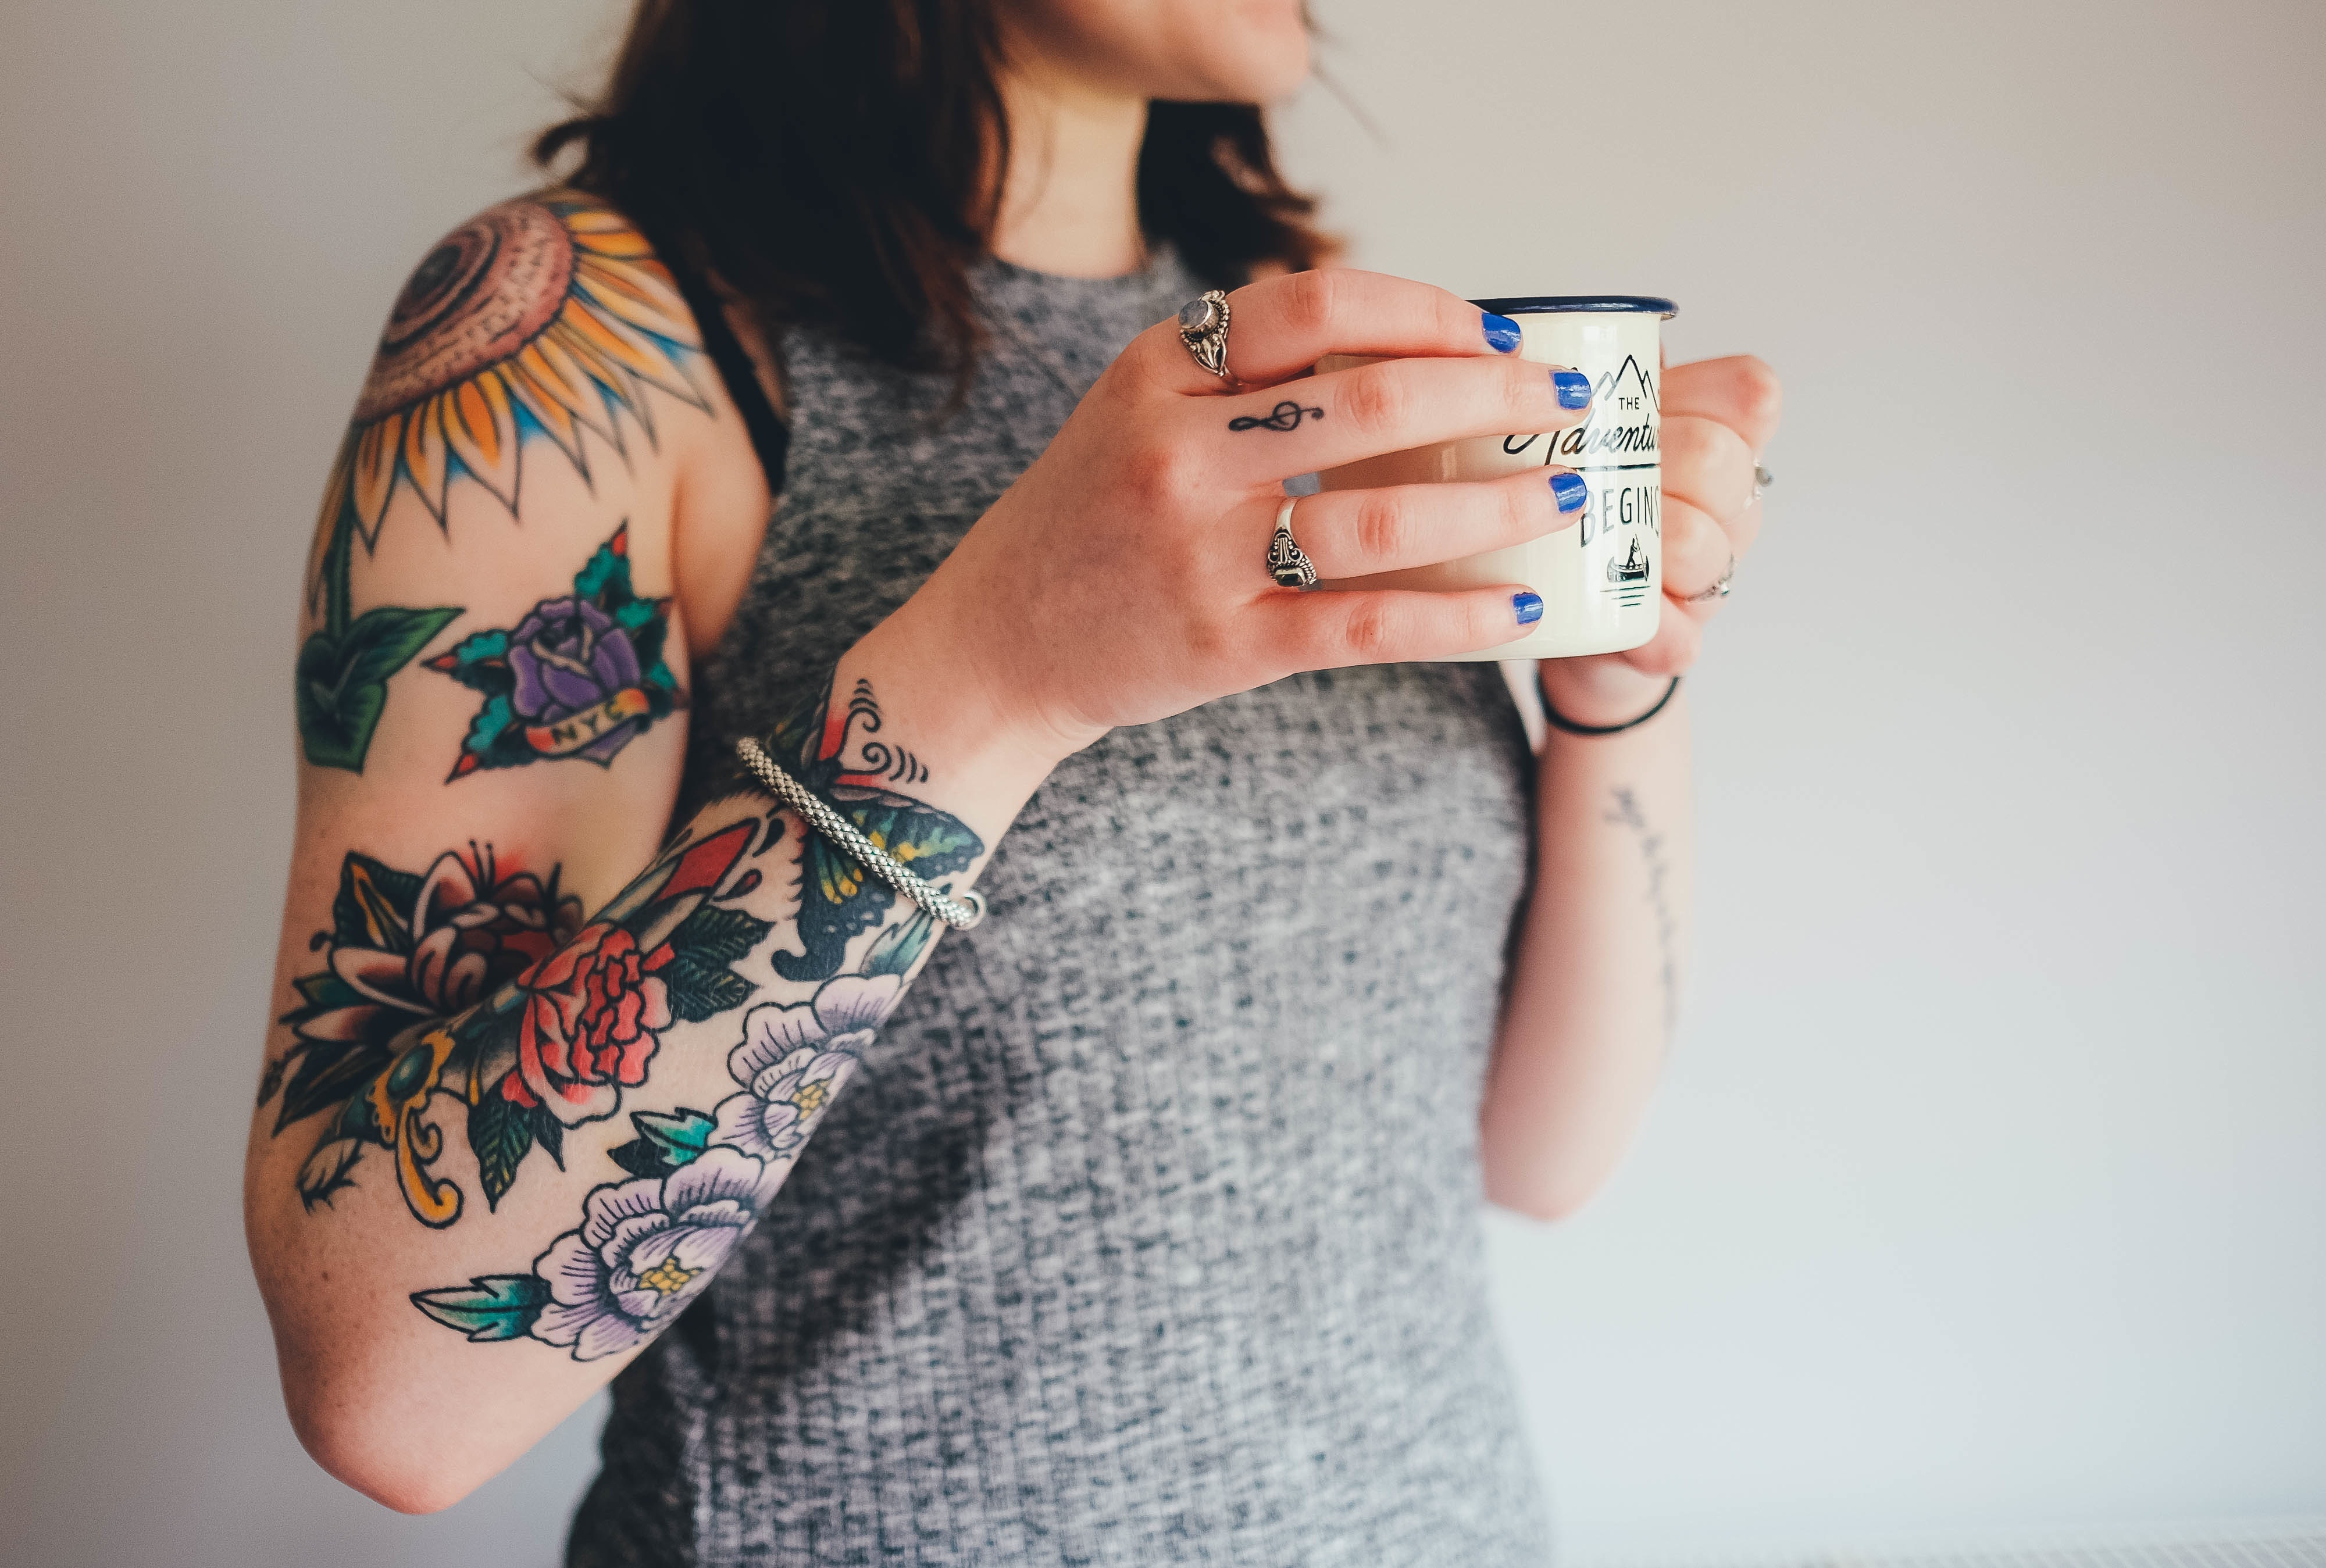 Clean skin no tattoo dating